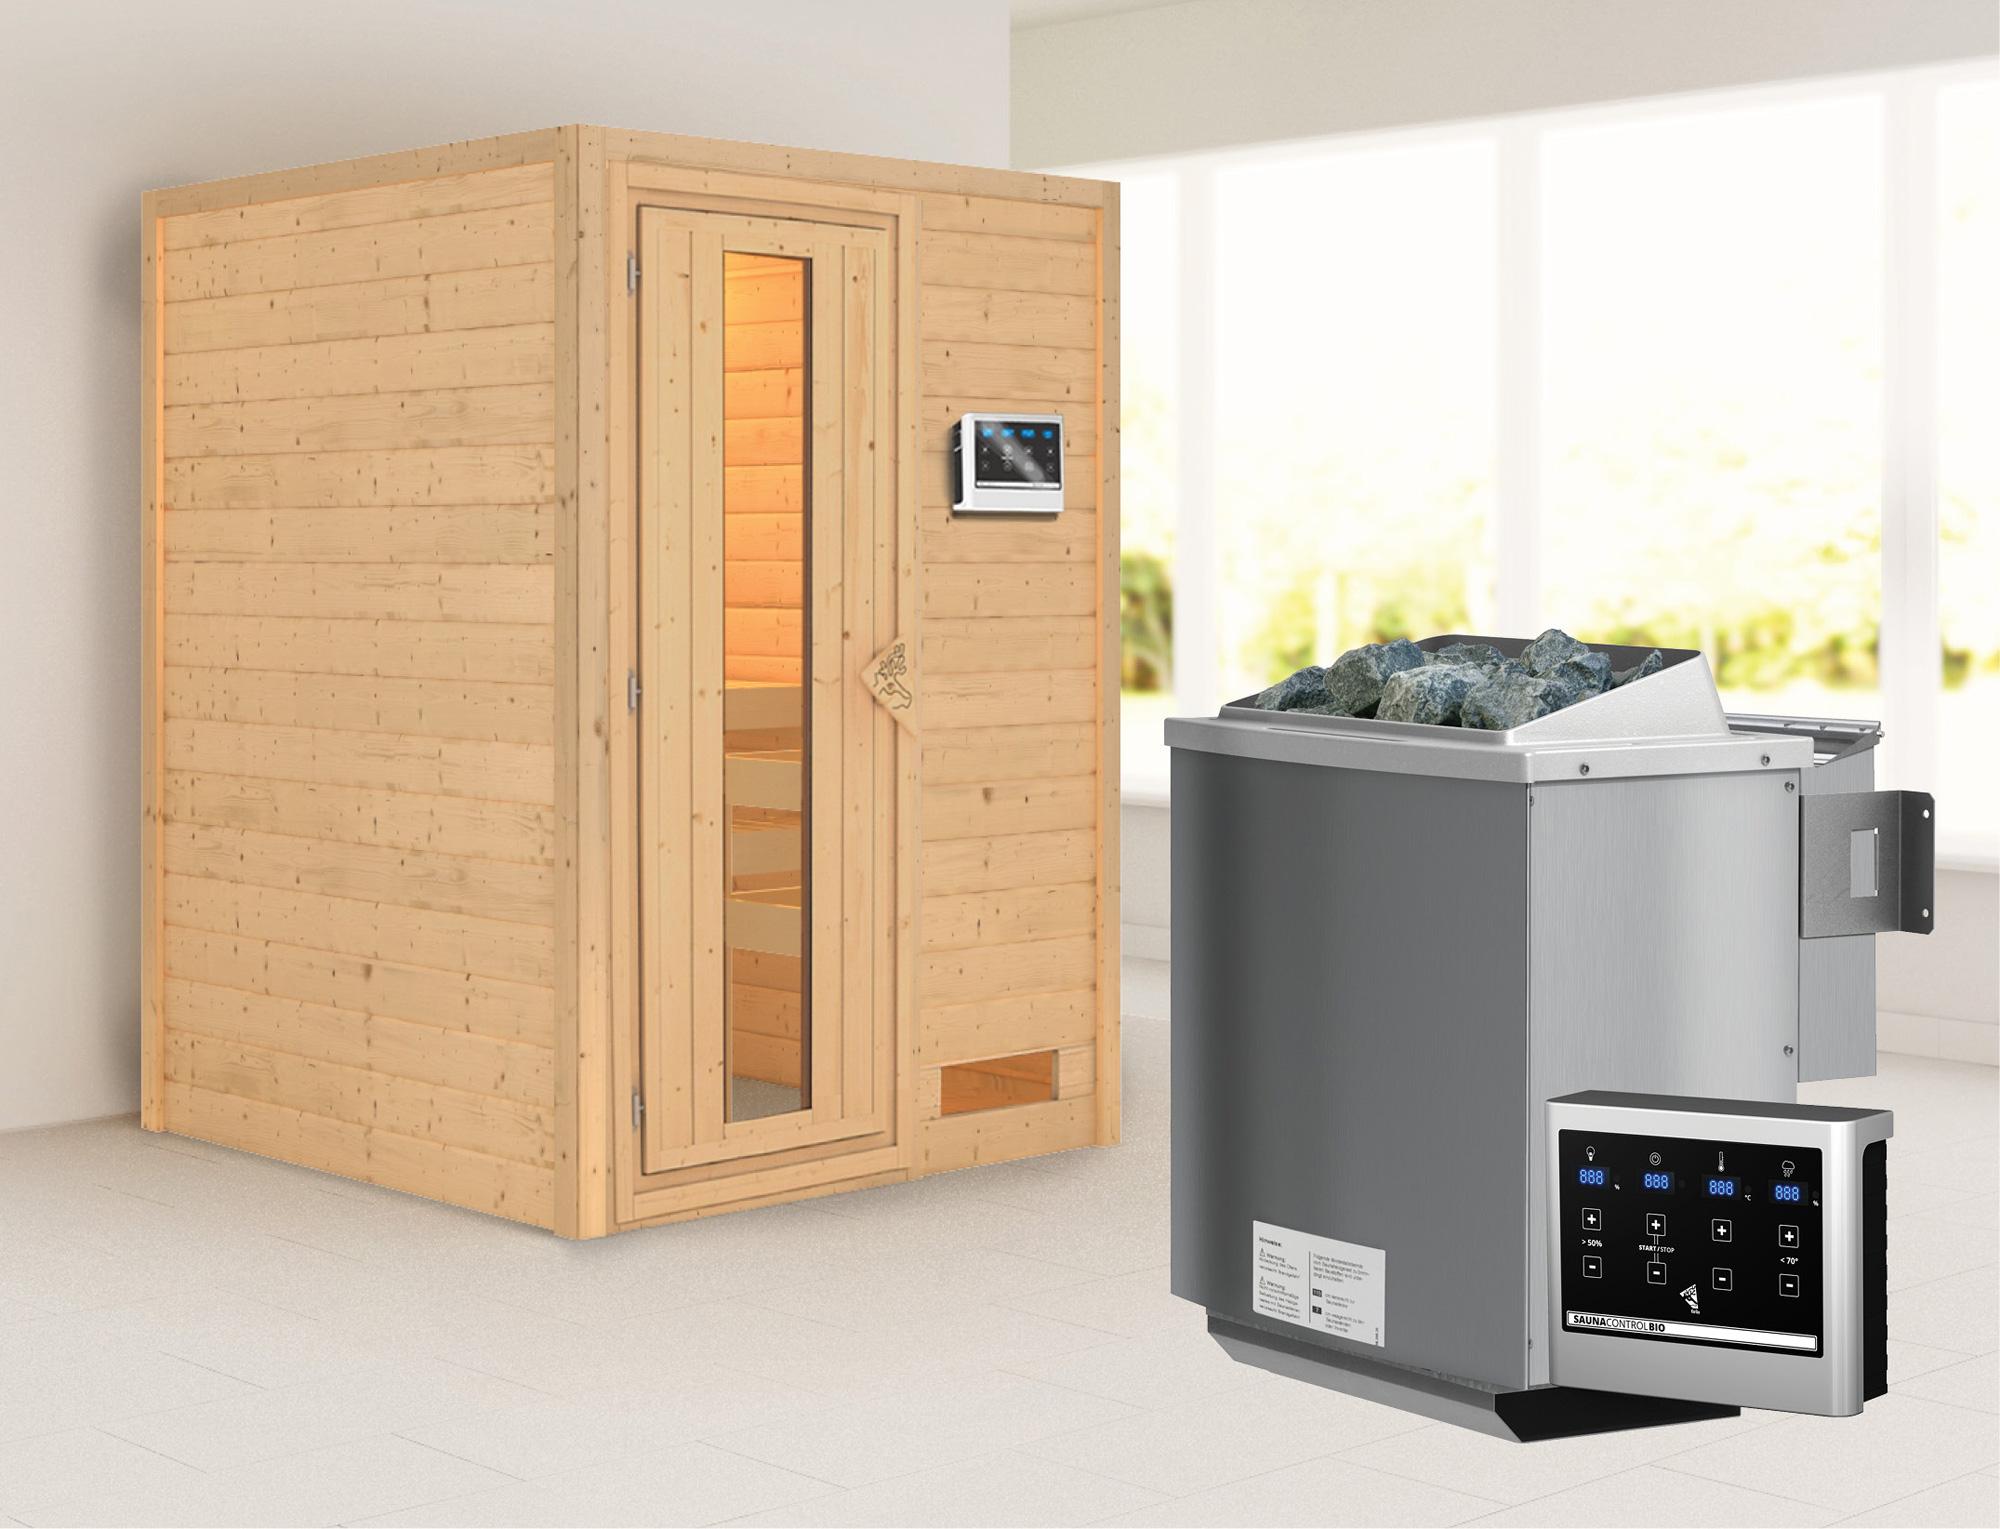 Woodfeeling Sauna Svenja 38mm mit Bio Saunaofen 9 kW extern Holztür Bild 1